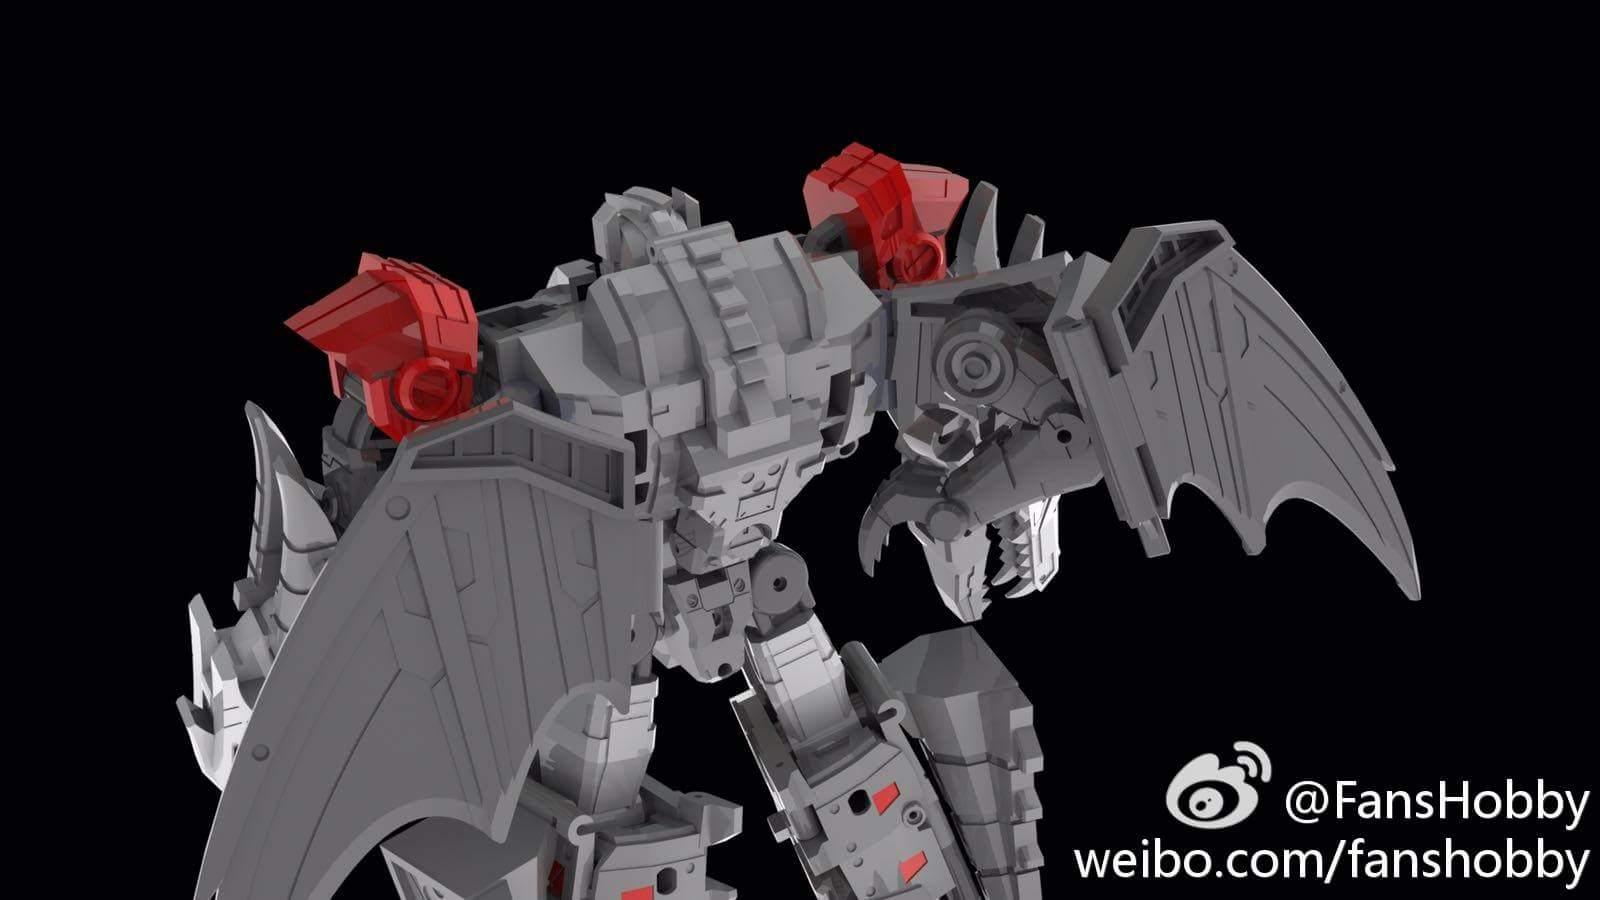 [FansHobby] Produit Tiers - Master Builder MB-02/03/05 - aka Monsterbots/Monstrebots - Page 2 SE3DM9tt